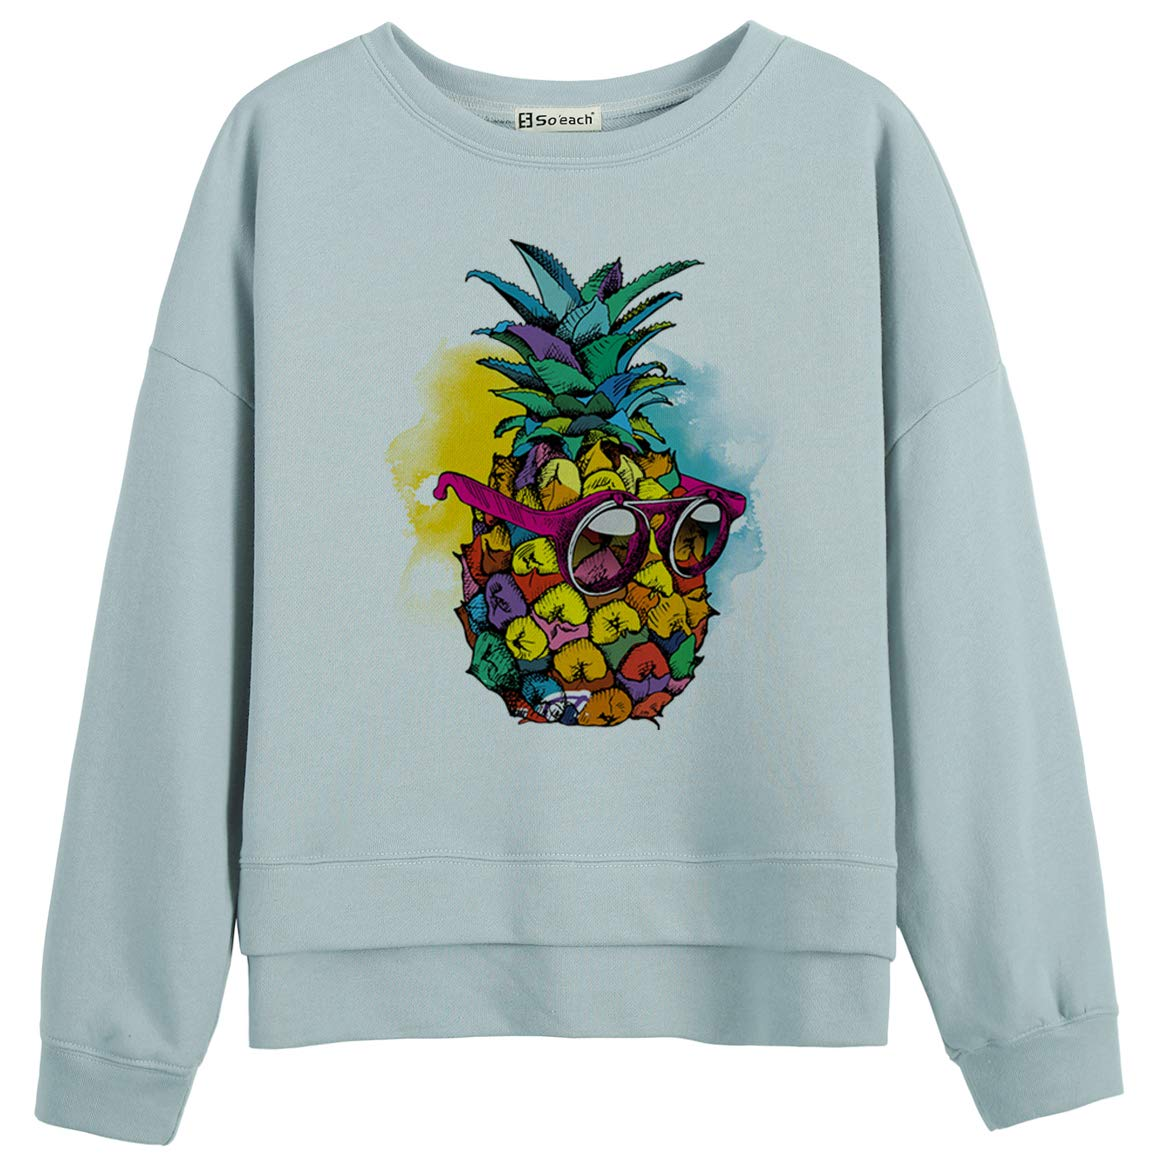 So'each Women Jumper Sweatshirt Sunglasses Pineapple Words Print Blue